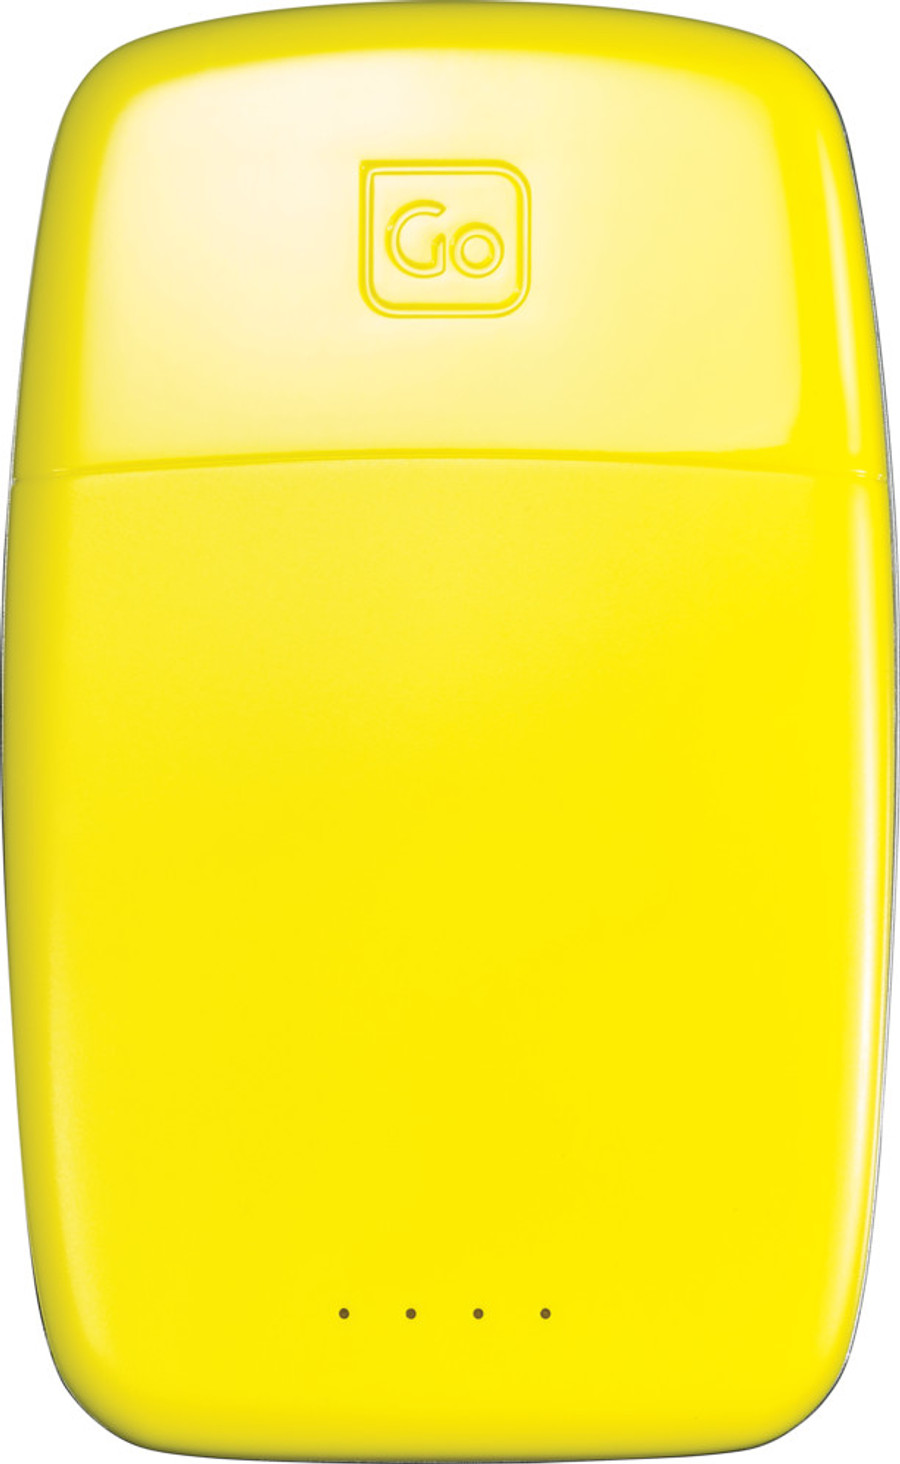 Power Bank 4000 - Yellow